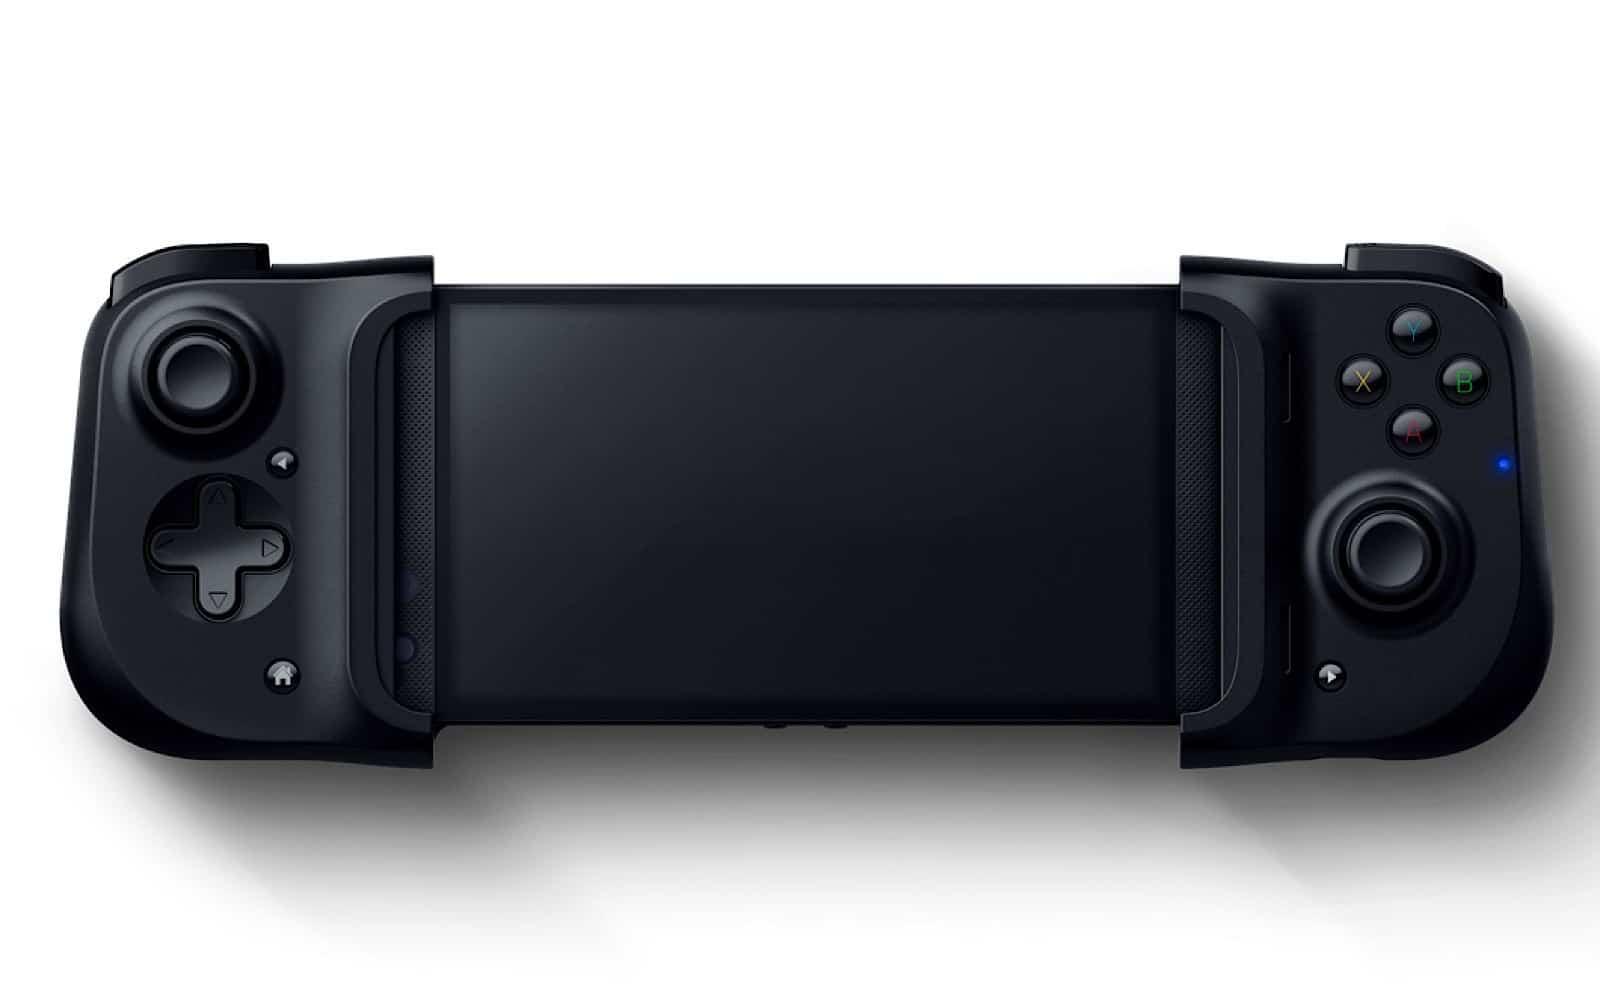 Razer Kishi game pad for phones